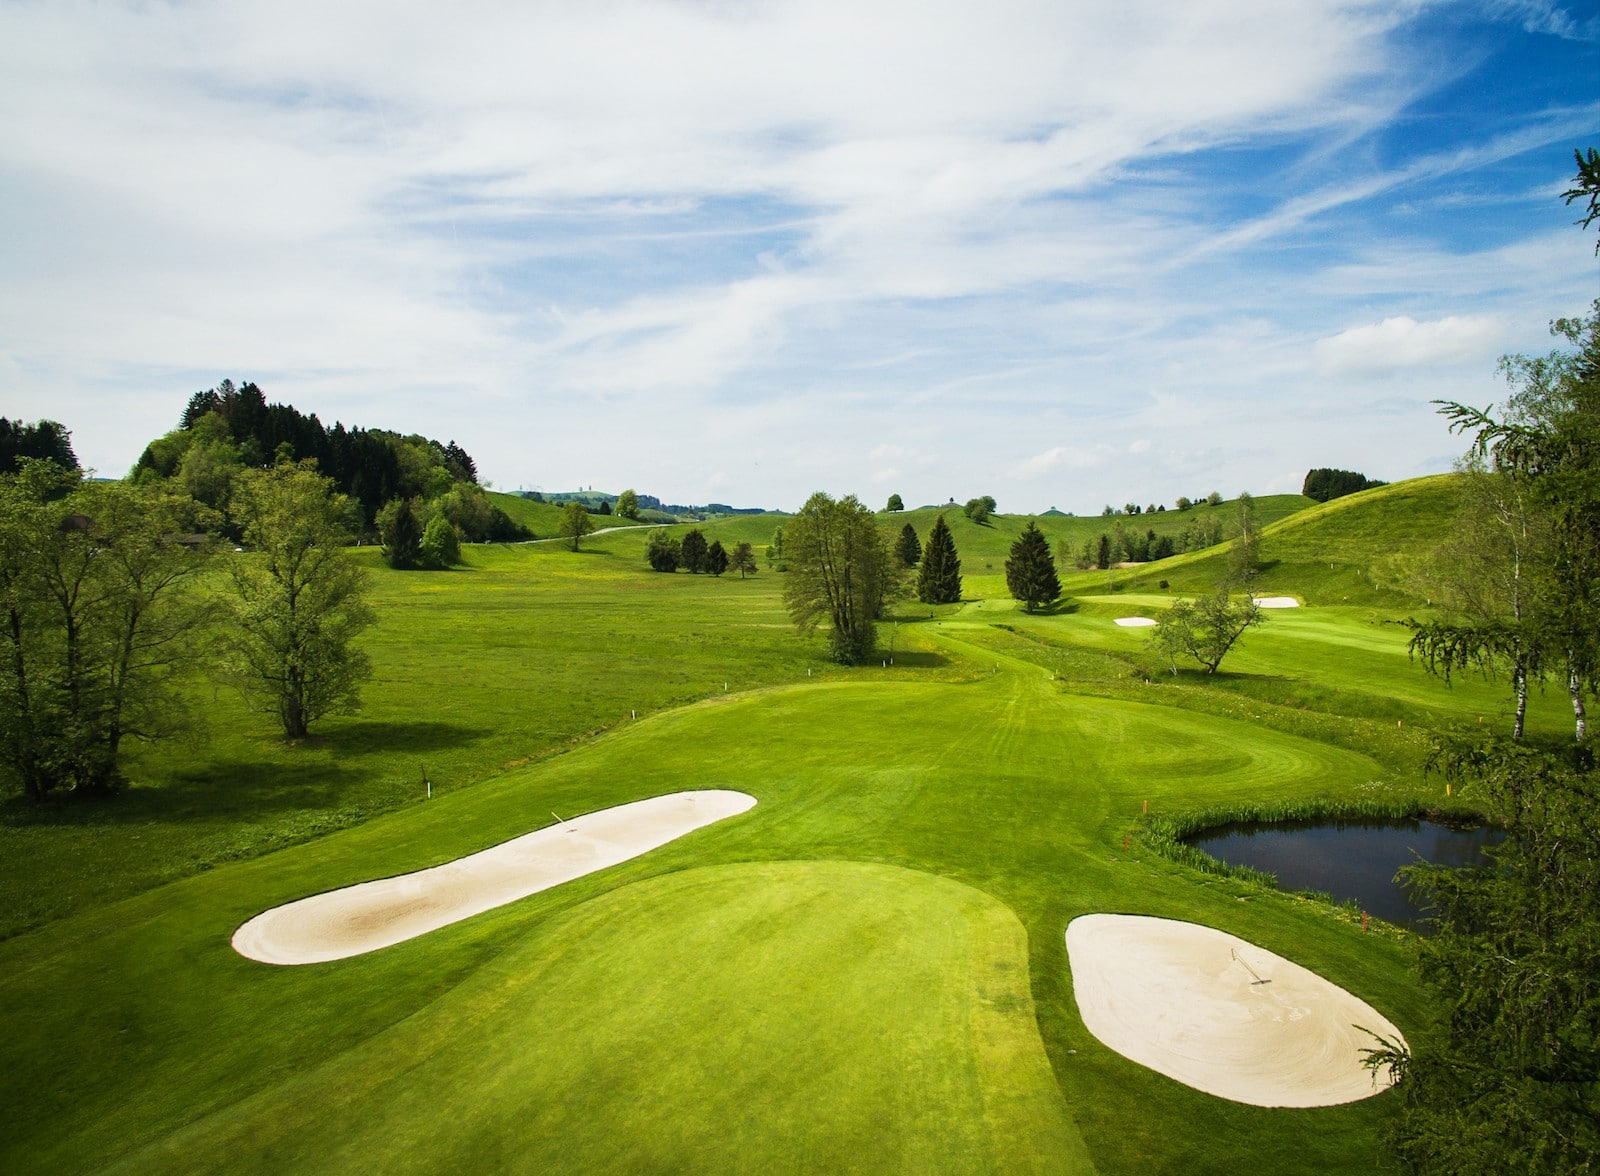 Golf & Country Club Schonenberg